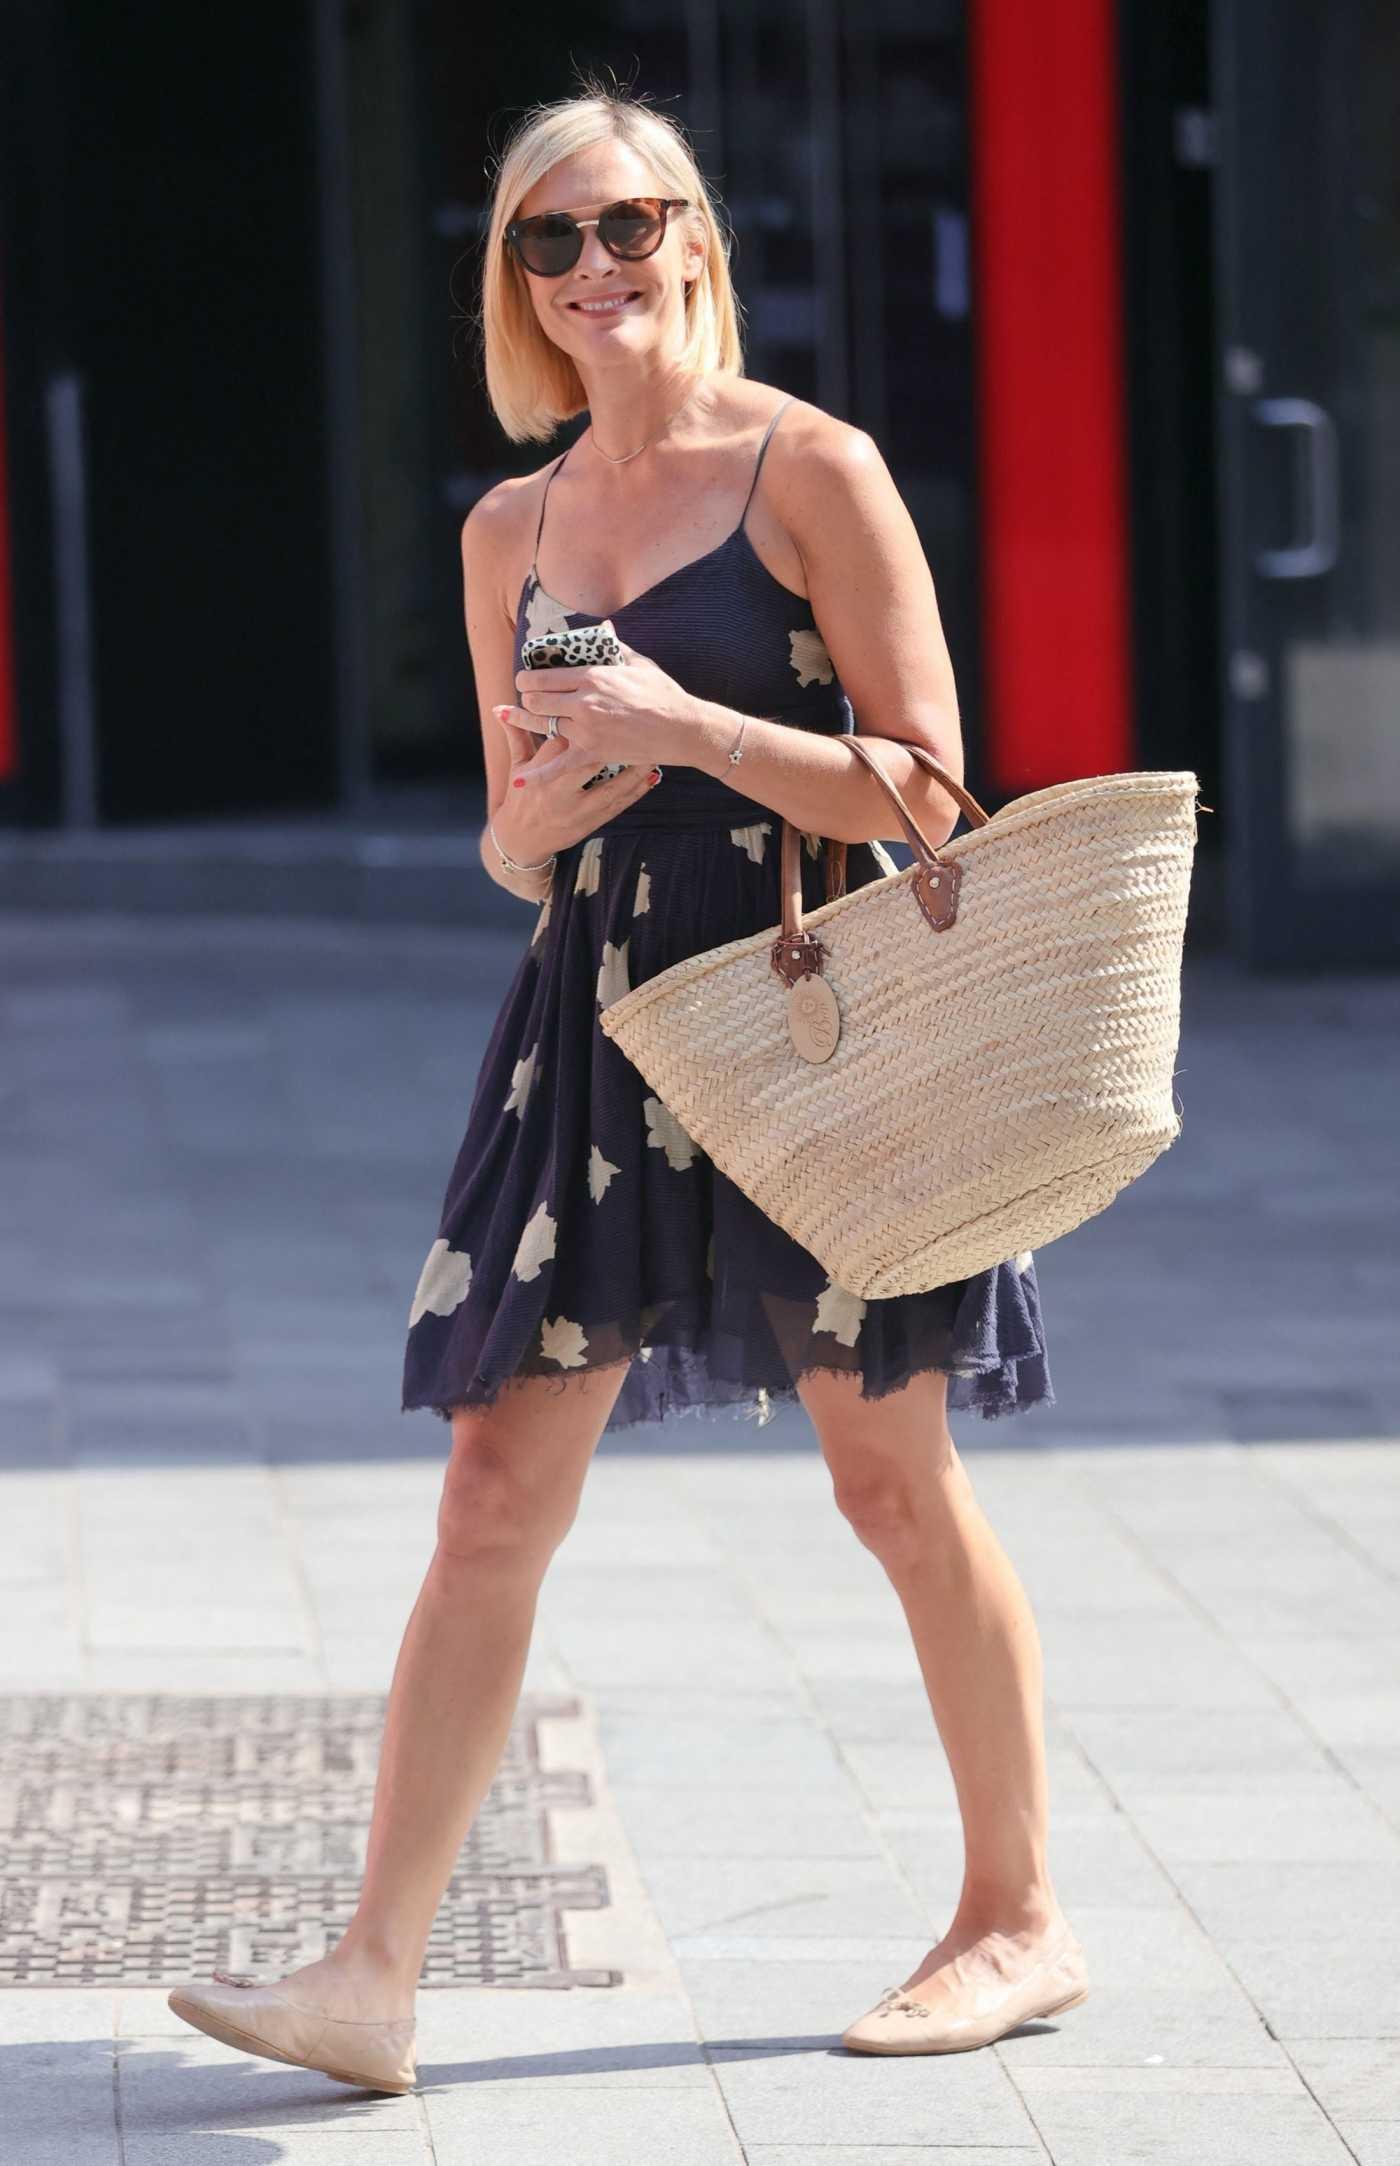 Jenni Falconer in a Black Summer Dress Leaves the Global Studios in London 07/19/2021